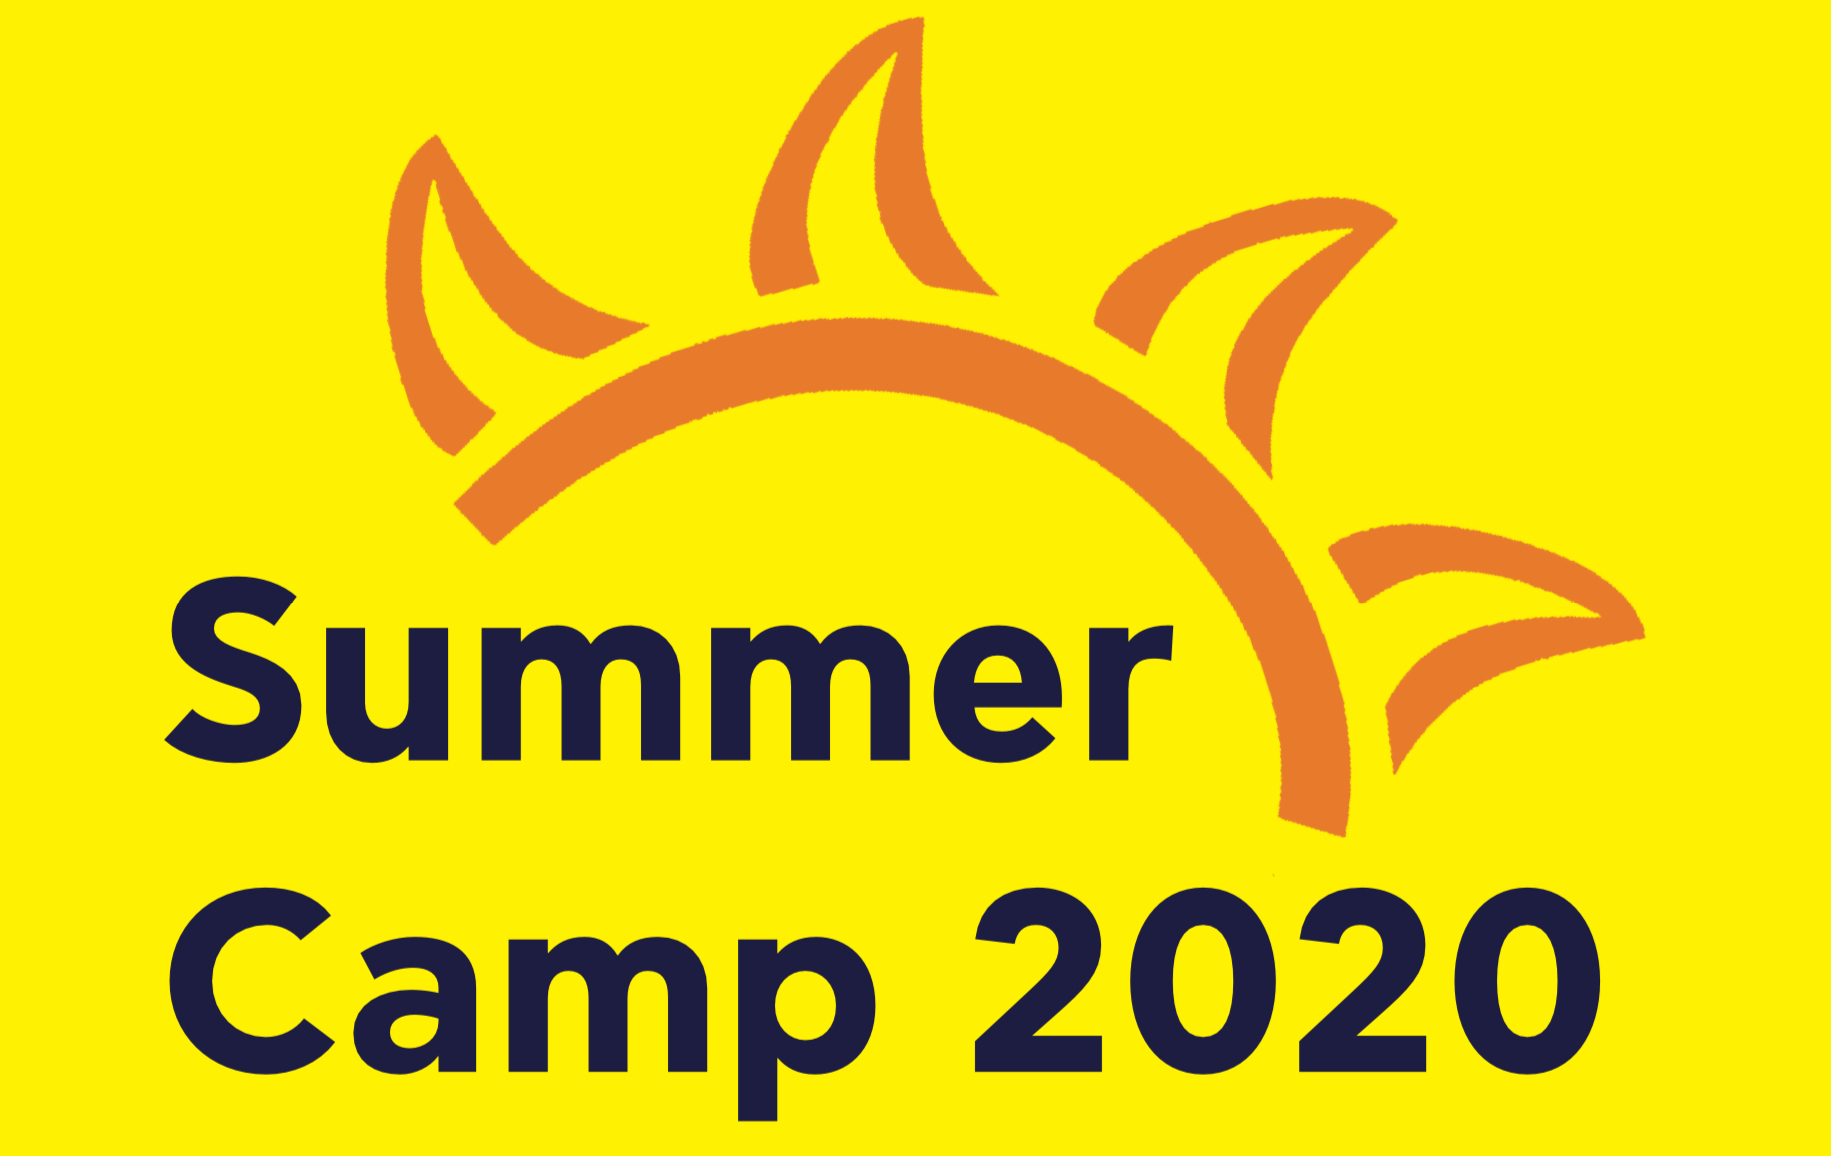 Pierce Summer Camp 2020 - Σε αναμονή των επίσημων ...